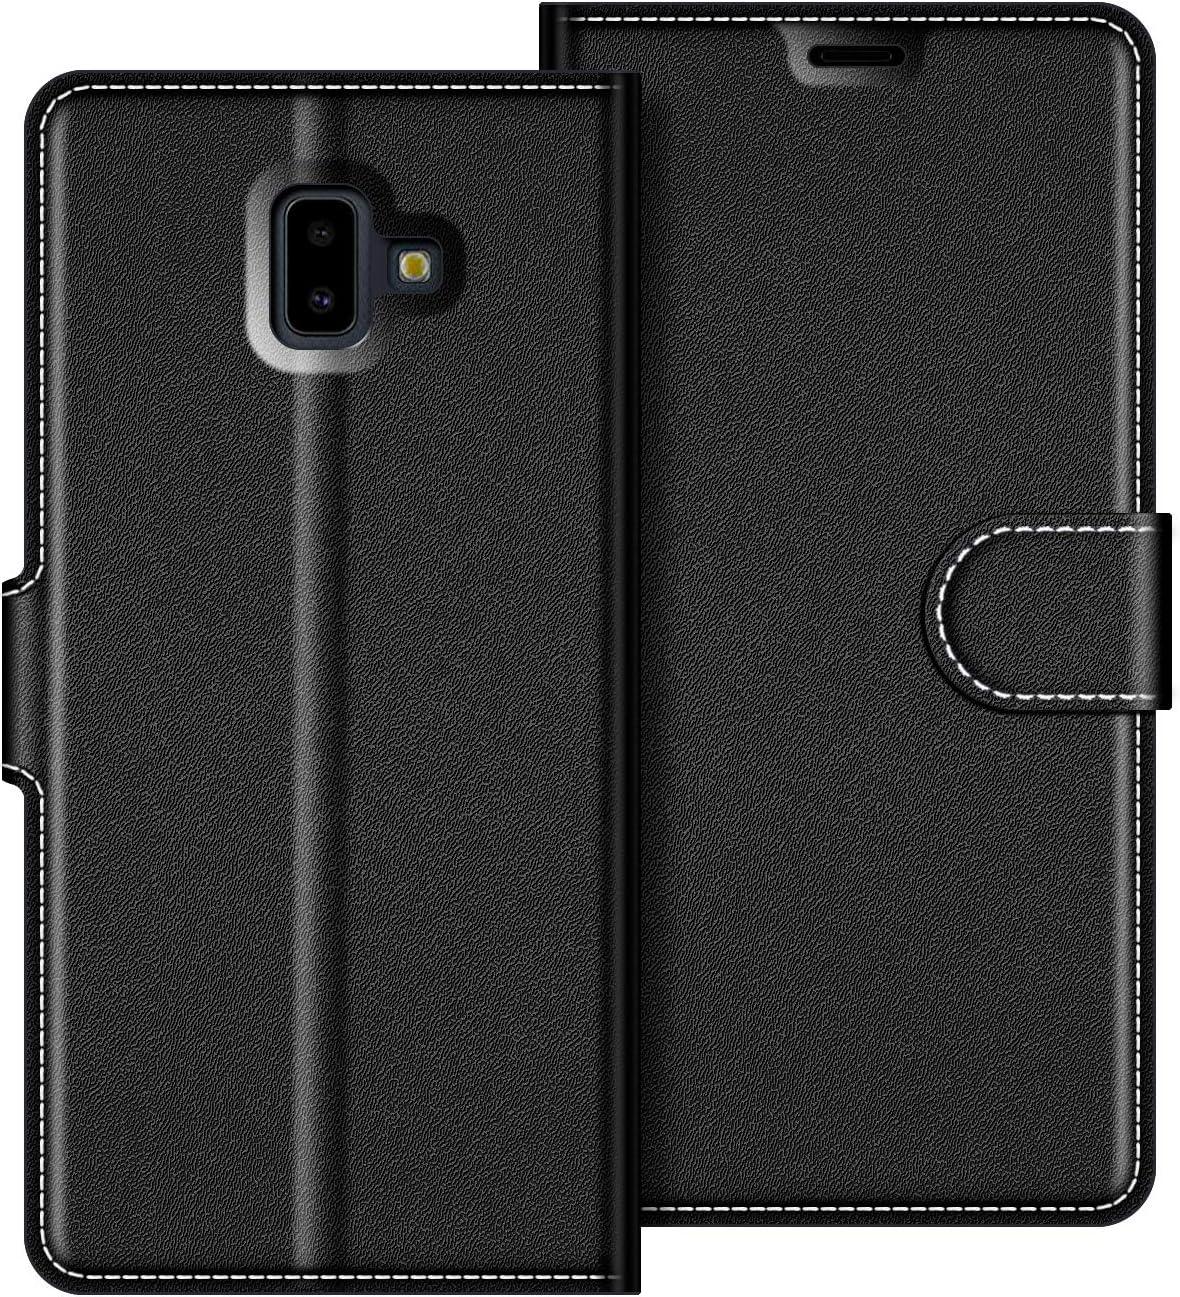 COODIO Funda Samsung Galaxy J6 Plus con Tapa, Funda Movil Samsung J6 Plus, Funda Libro Galaxy J6 Plus Carcasa Magnético Funda para Samsung Galaxy J6 Plus 2018, Negro